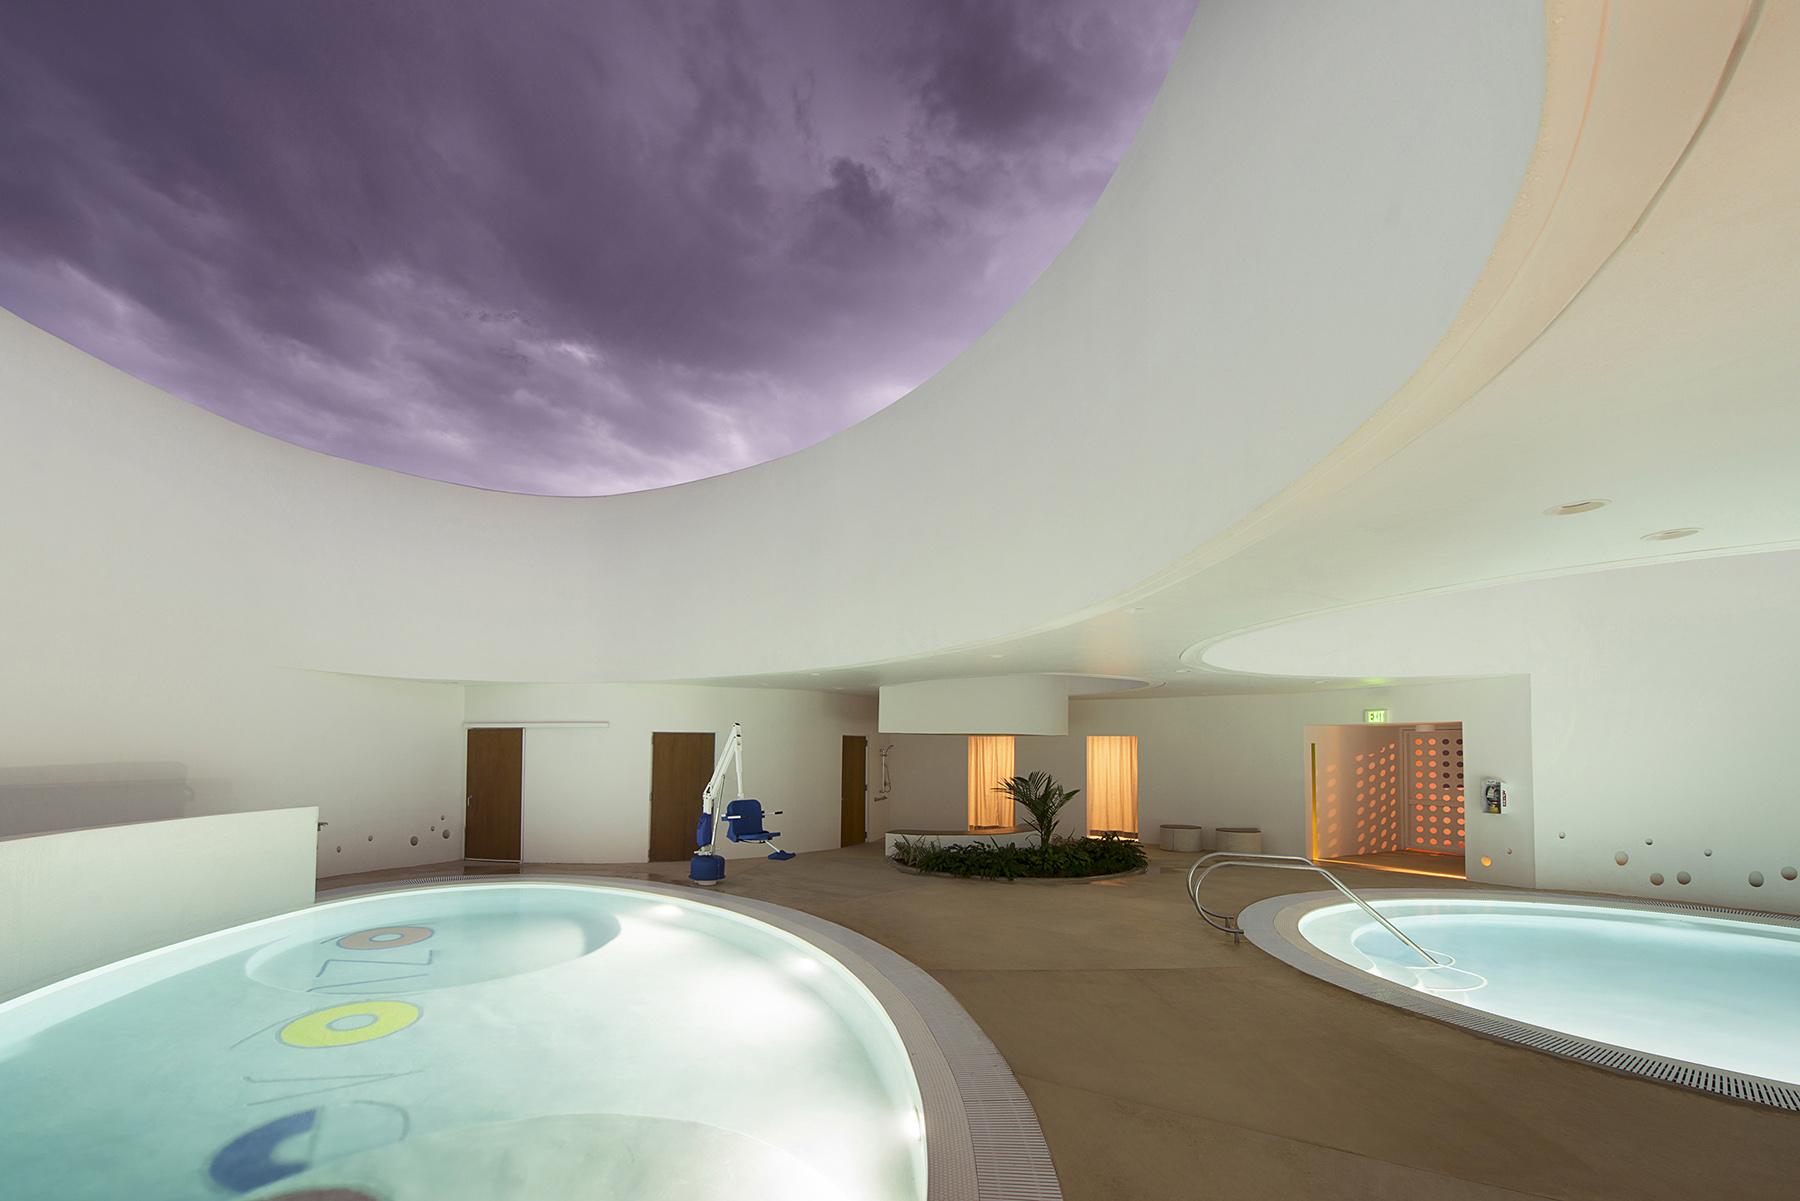 Piscinas_Terapeuticas_Therapeutic_Pools_San_ Juan_Puerto_Rico_Fuster_Architects.jpg